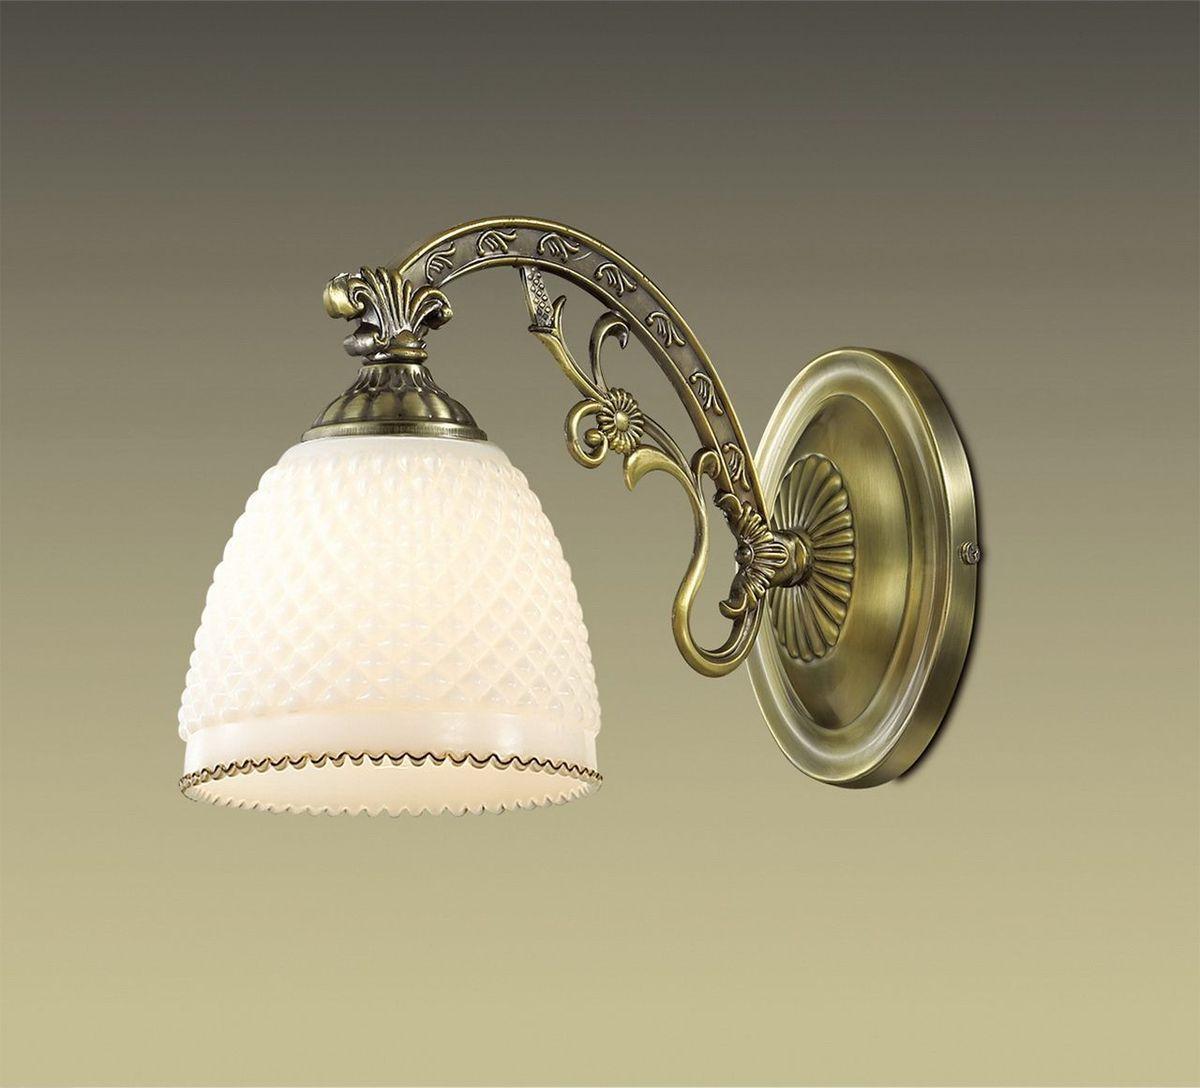 Бра Odeon Light Masala, 1 х E14, 40W. 2868/1W бра odeon light sansa 1 х e14 40w 3127 1w